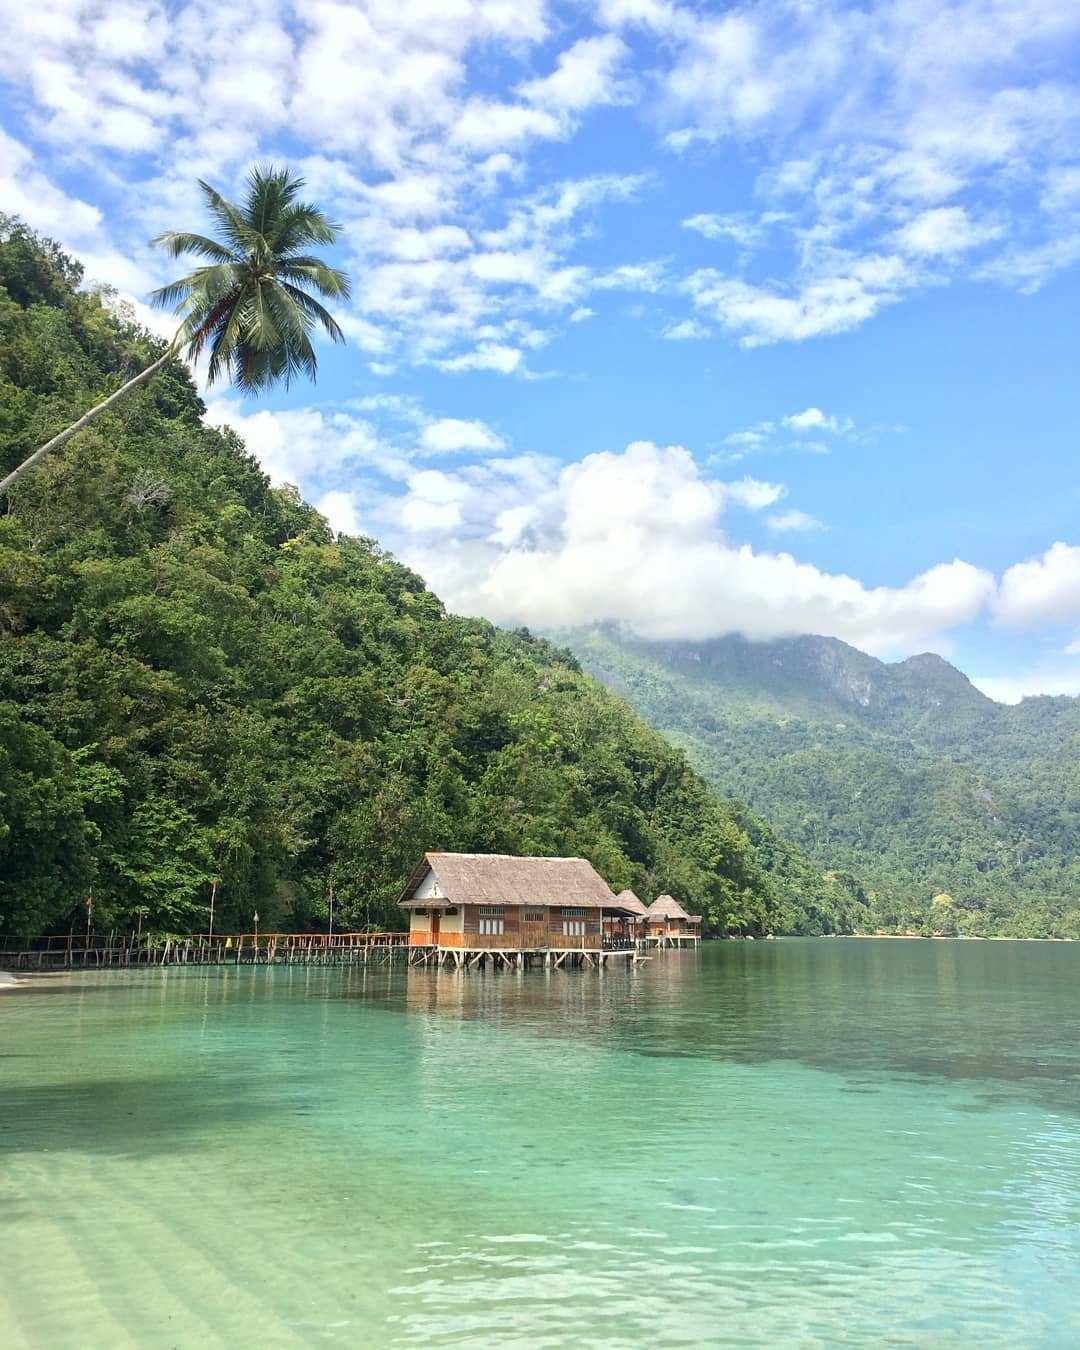 Pasir Putih di Pantai Ora Maluku, Image From @febryranger